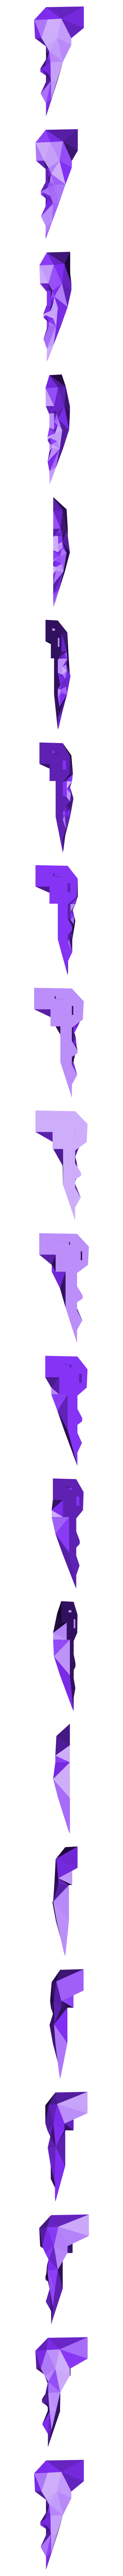 Hidden drawer Rock Top.stl Télécharger fichier STL gratuit Hogwarts School of Witchcraft • Plan à imprimer en 3D, Valient